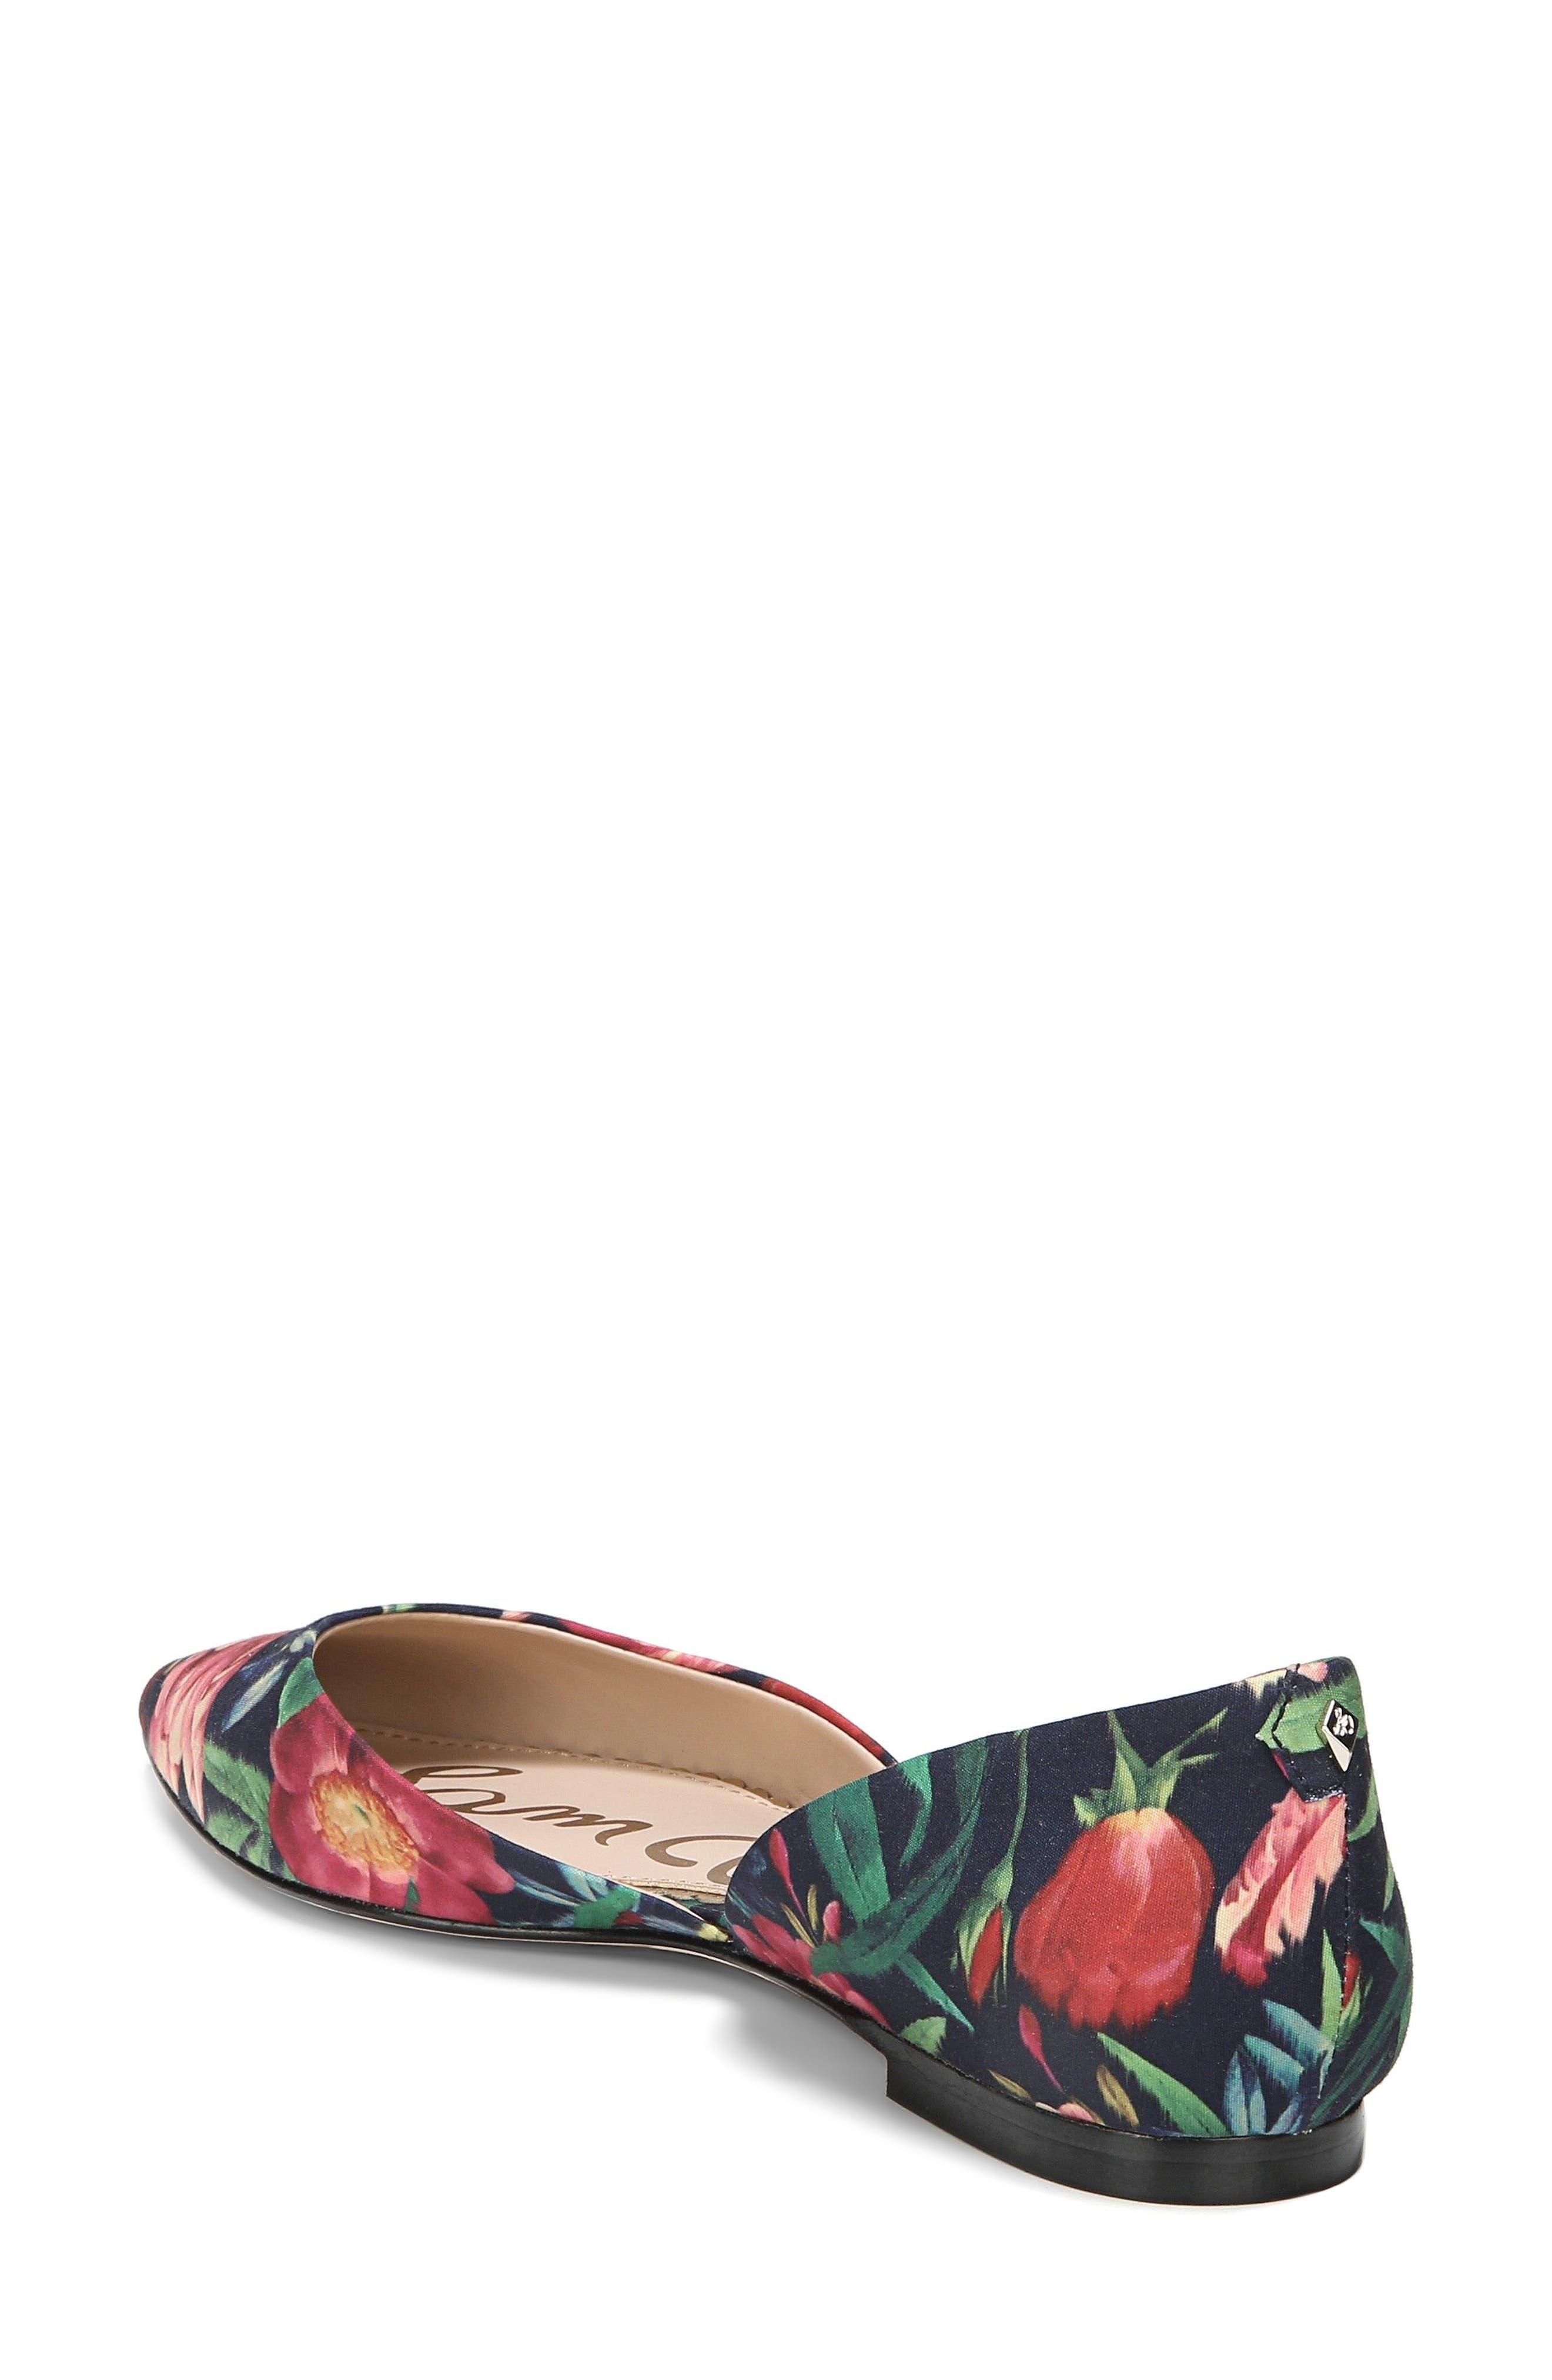 Rodney Pointy Toe d'Orsay Flat,                             Alternate thumbnail 2, color,                             Navy Multi Fabric